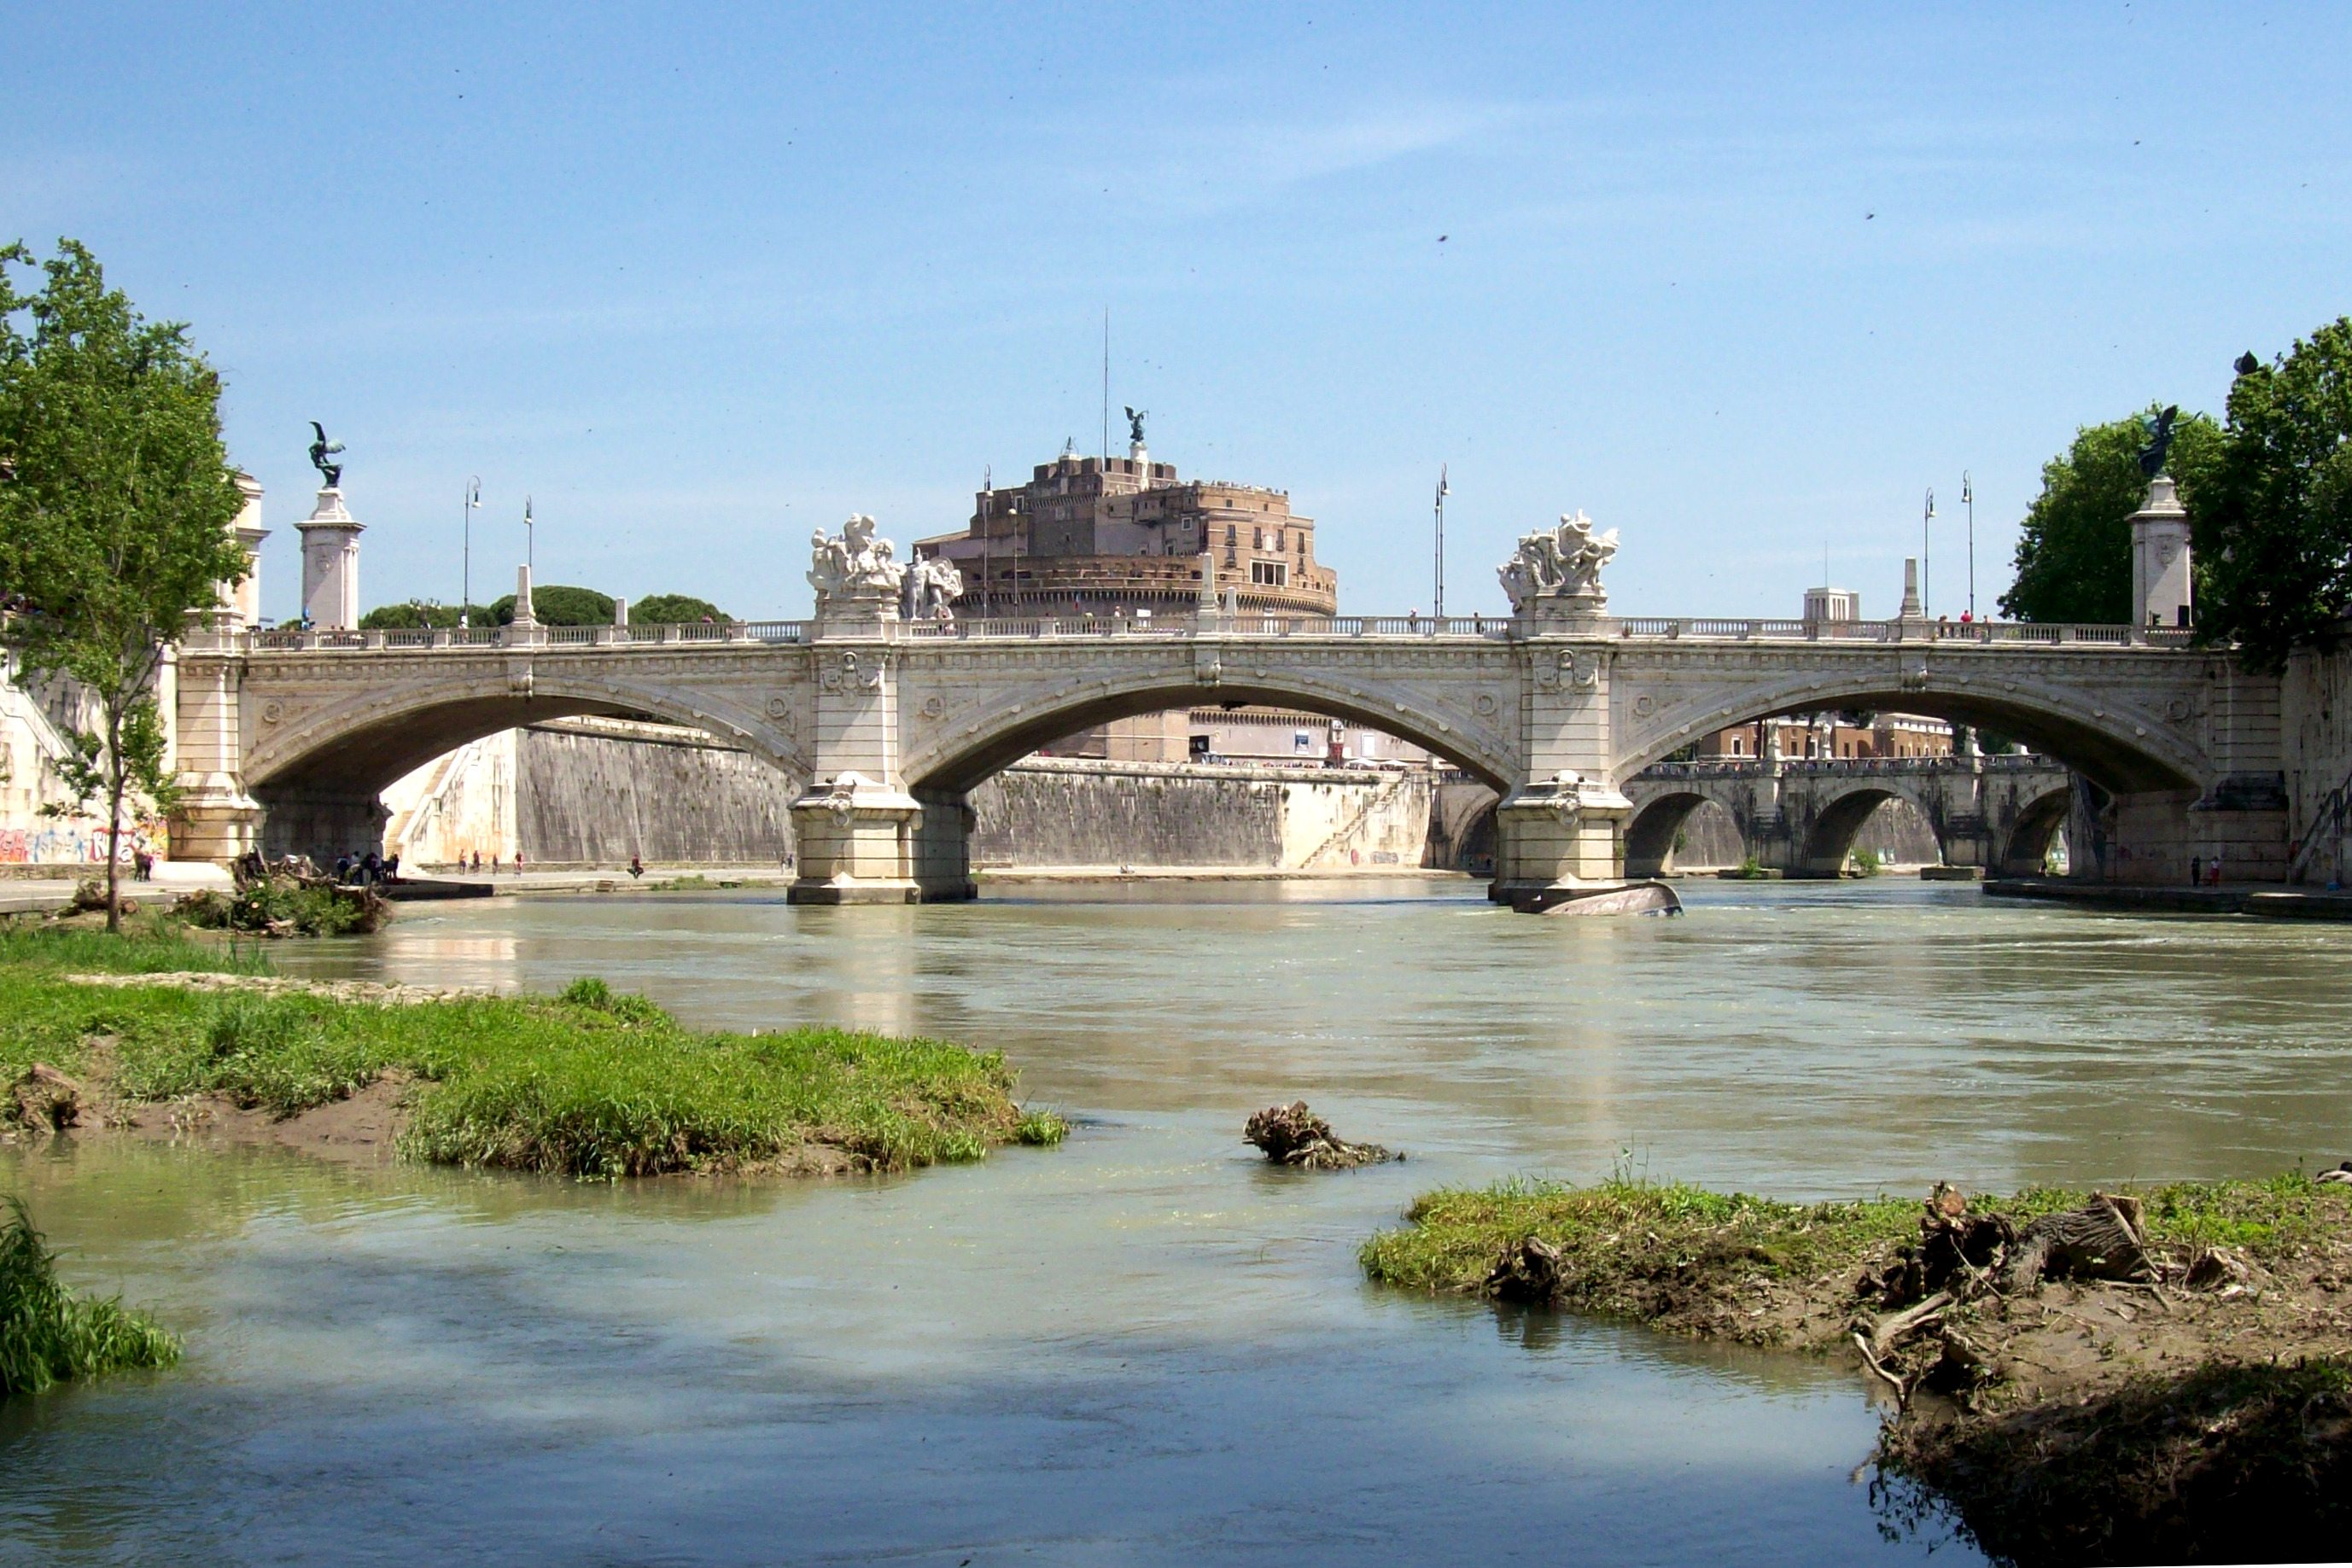 File:2014-05-10 Ponte Vittorio Emanuele II Roma.jpg - Wikipedia